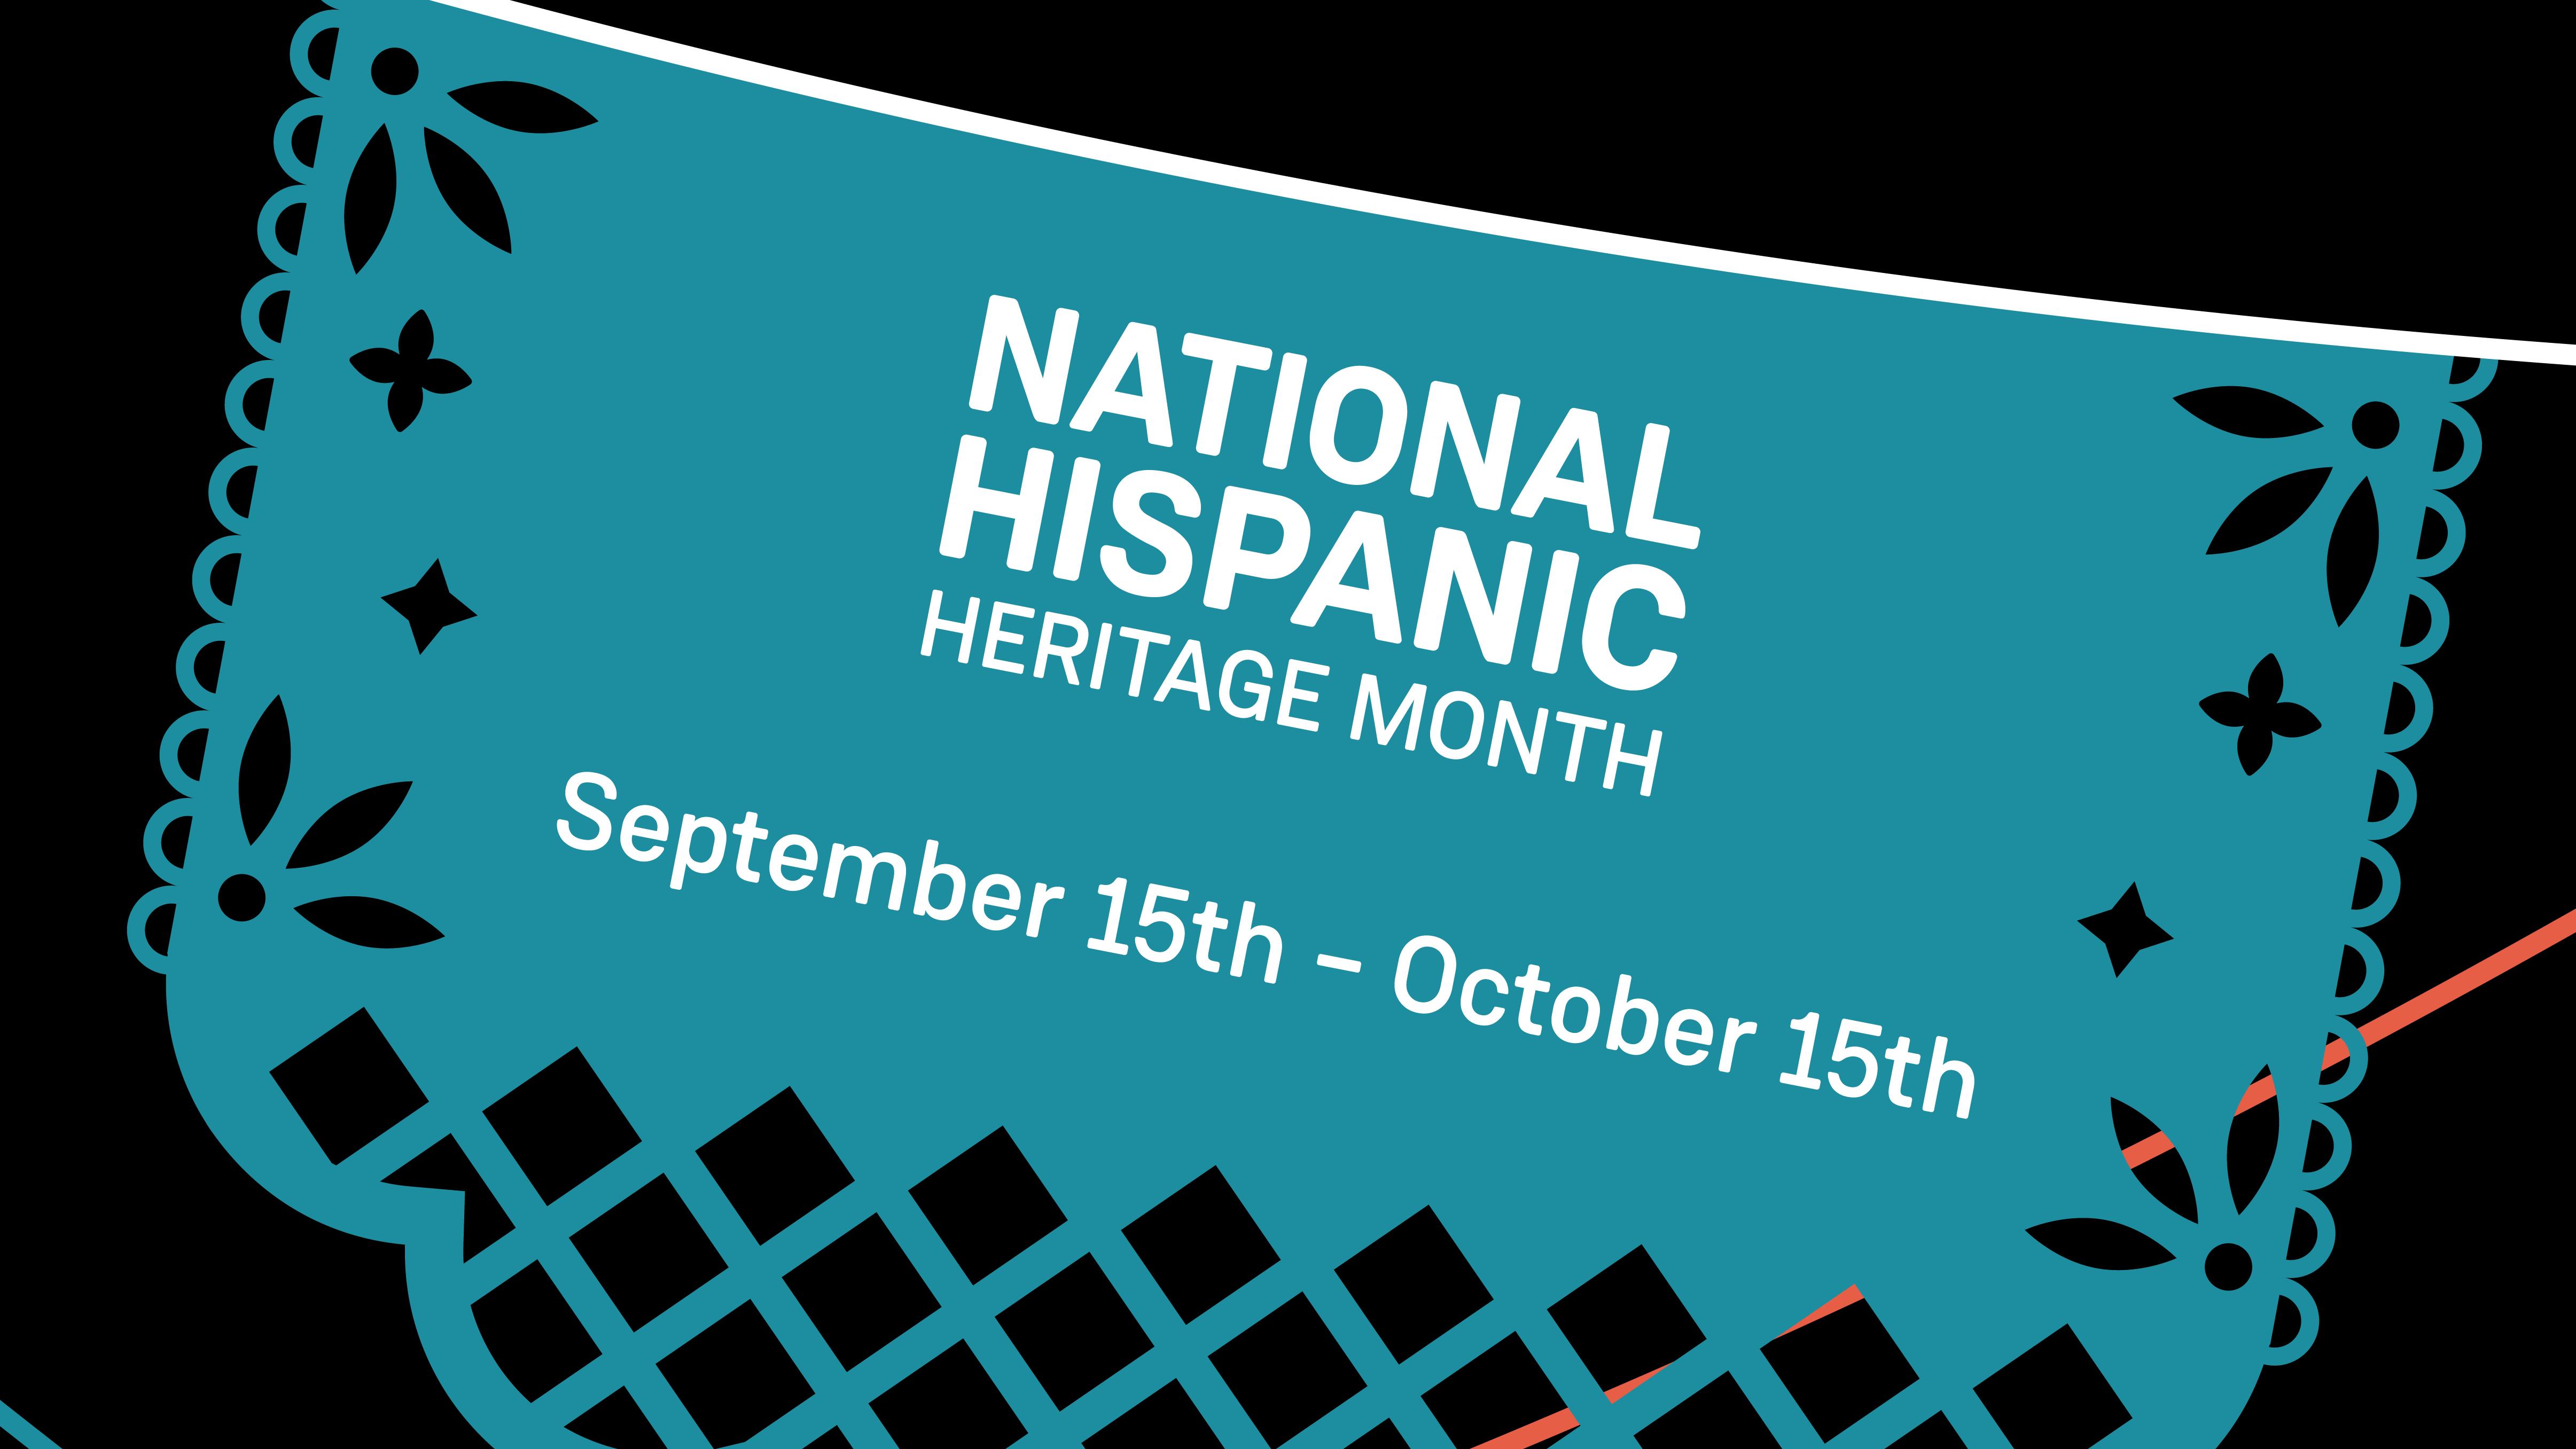 Decorative blue flag declaring the dates of National Hispanic Heritage Month.